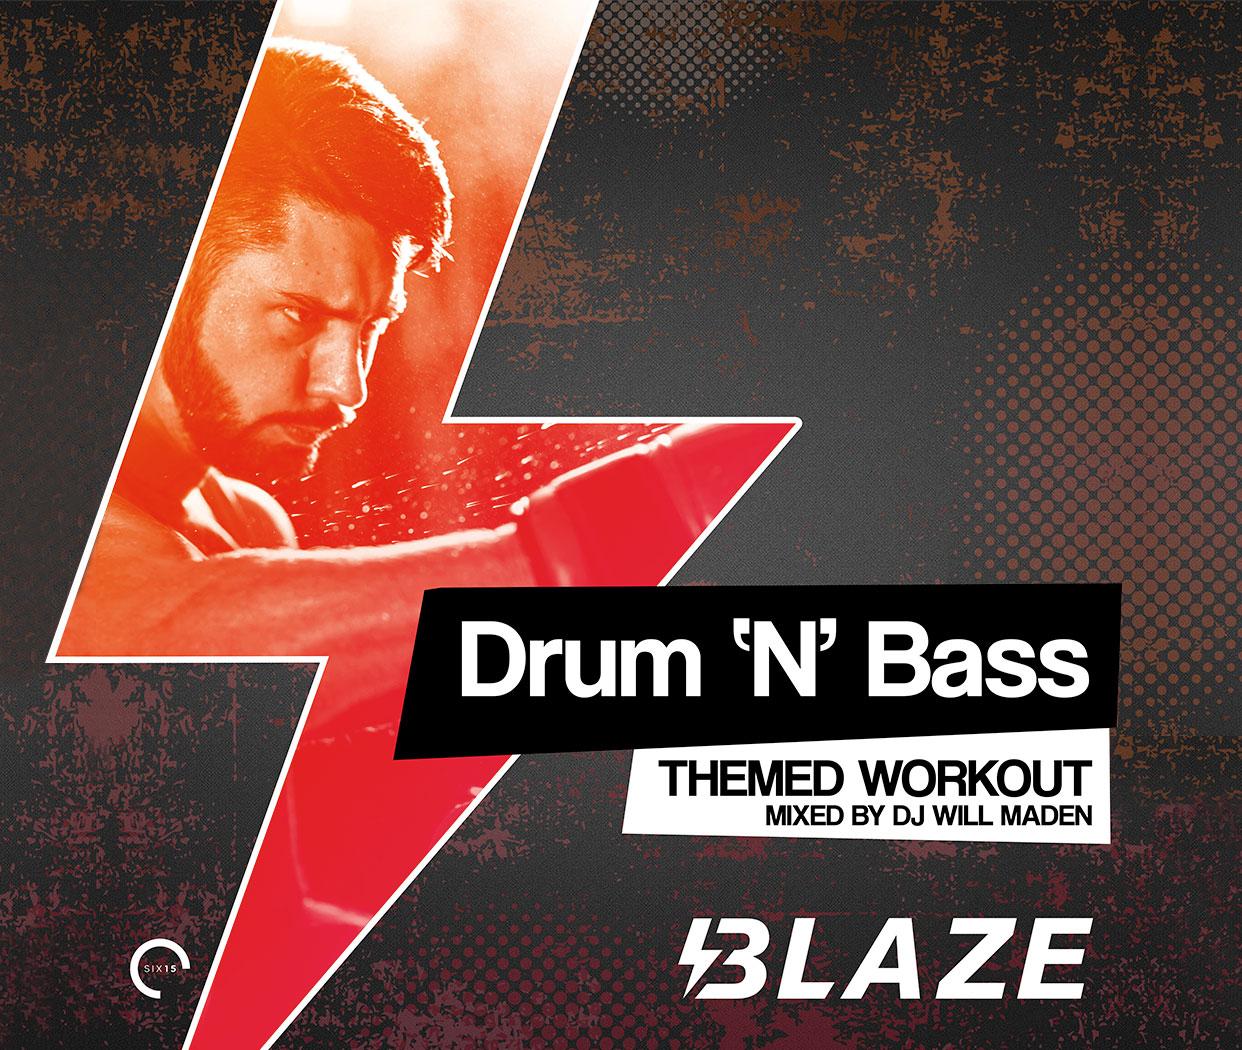 Blaze - Drum 'N' Bass!